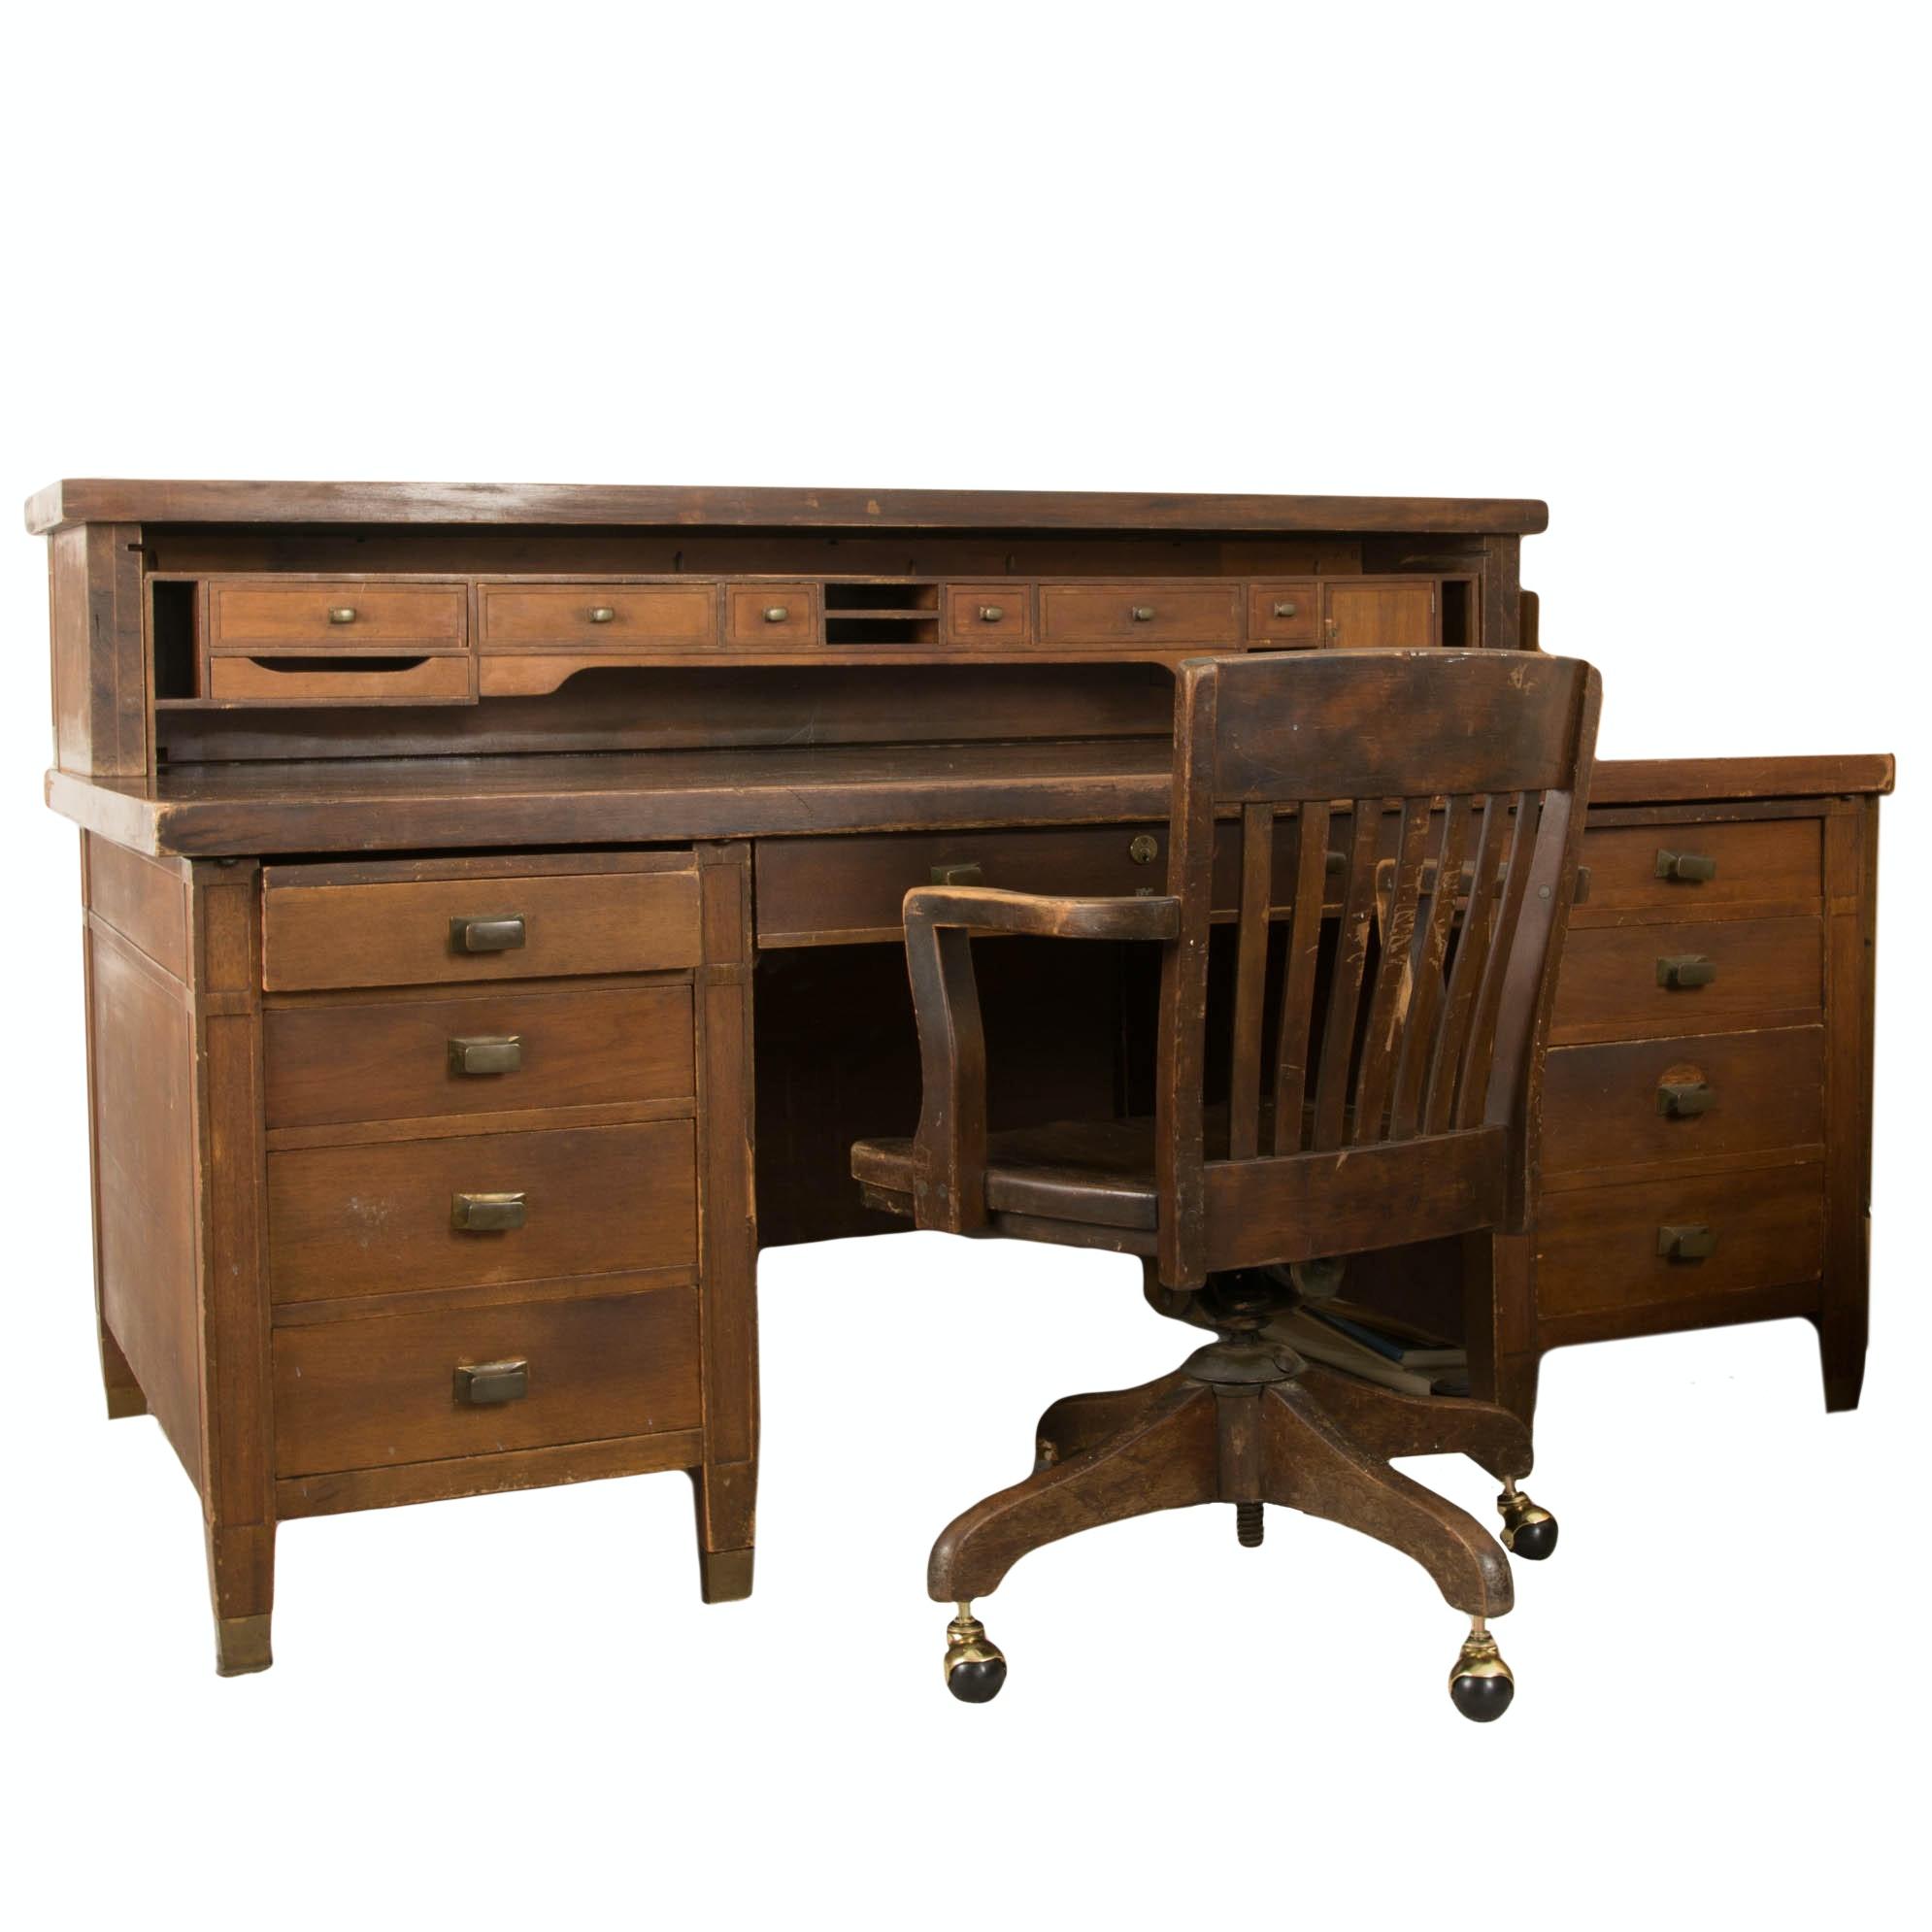 Vintage Cutler Railway Station Walnut Desk with Office Chair